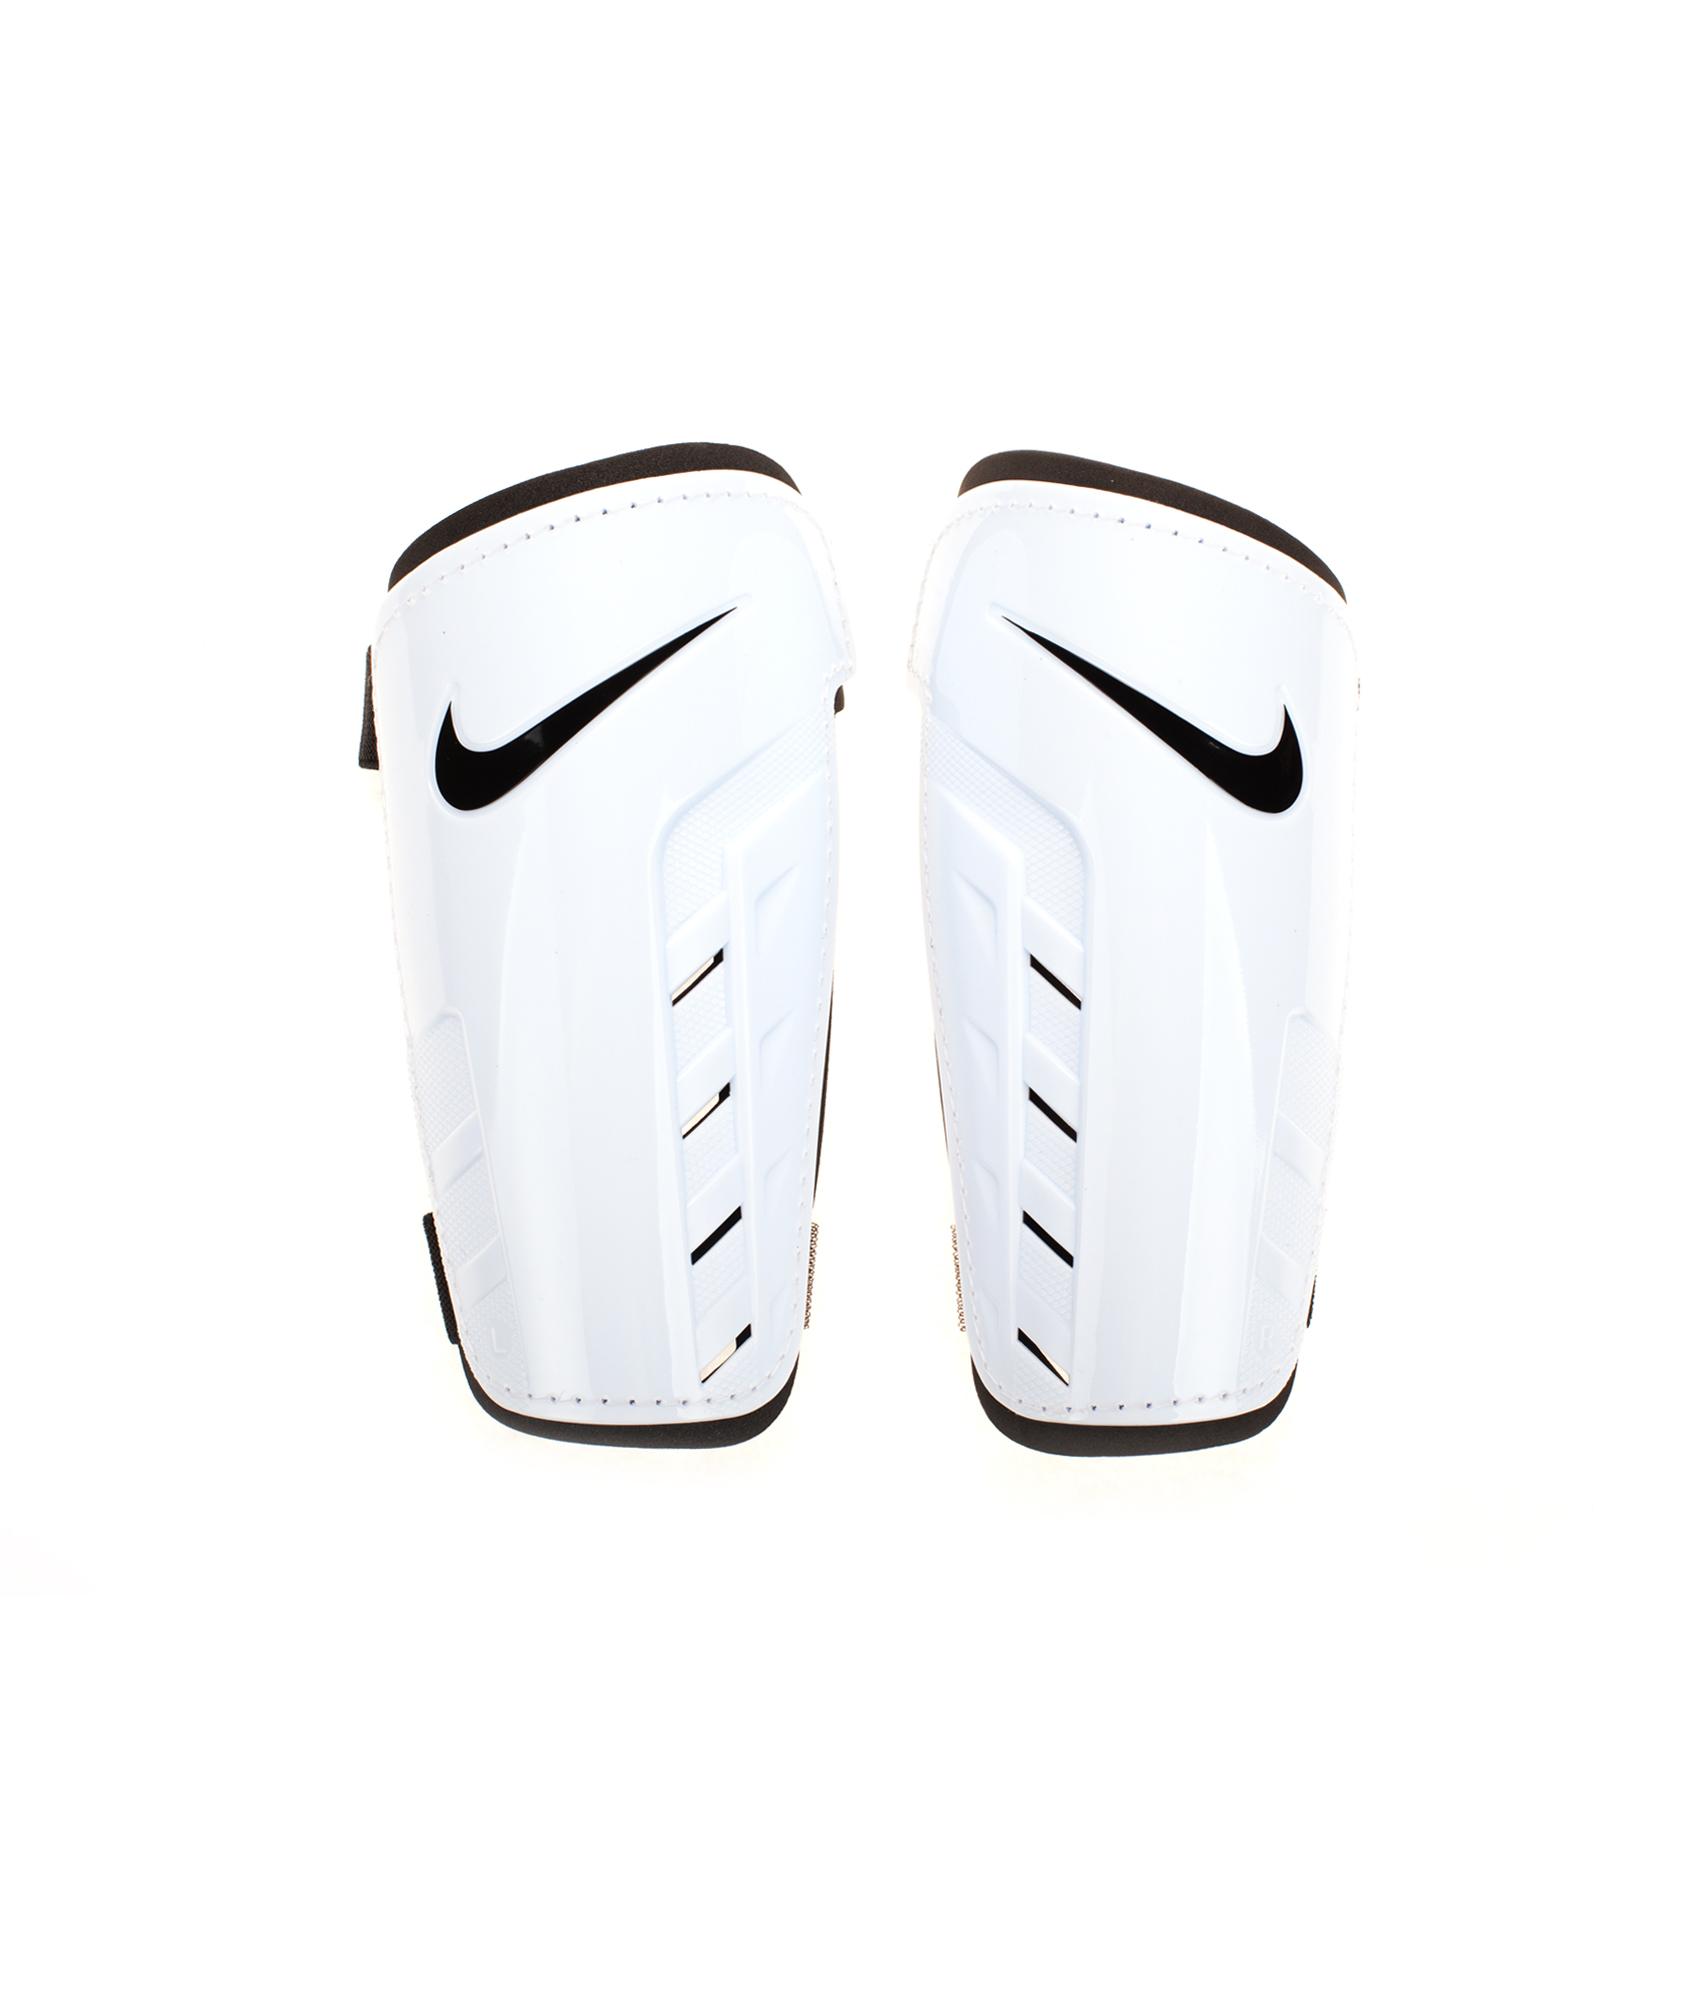 Щитки Nike, Цвет-Белый, Размер-L чулок д щитков nike guard lock elite sleeve su12 se0173 011 l чёрный